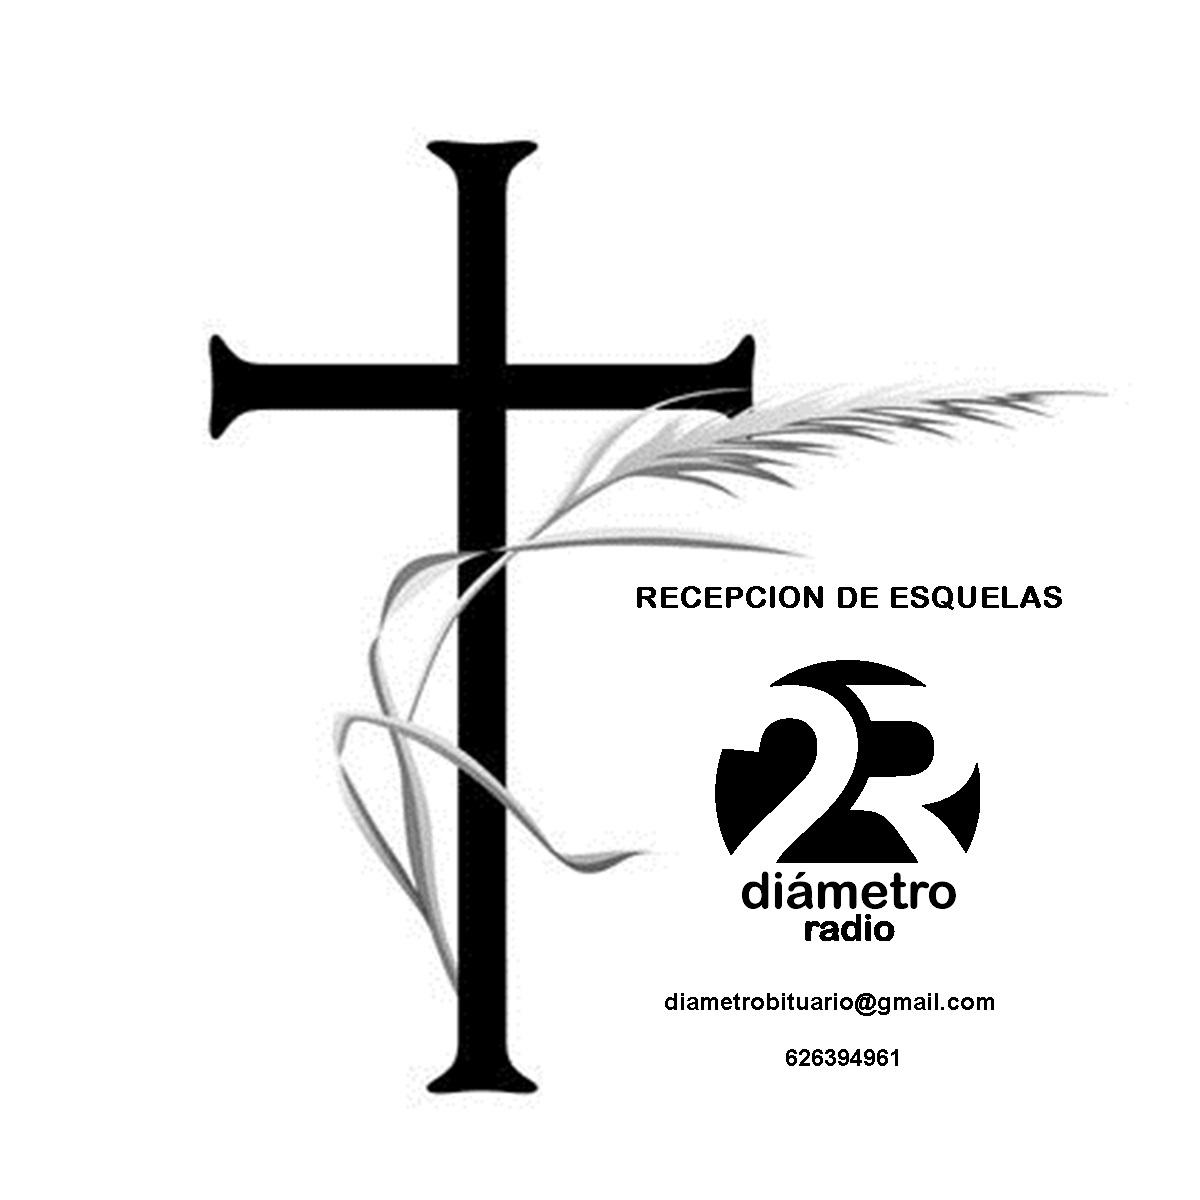 Diametro2